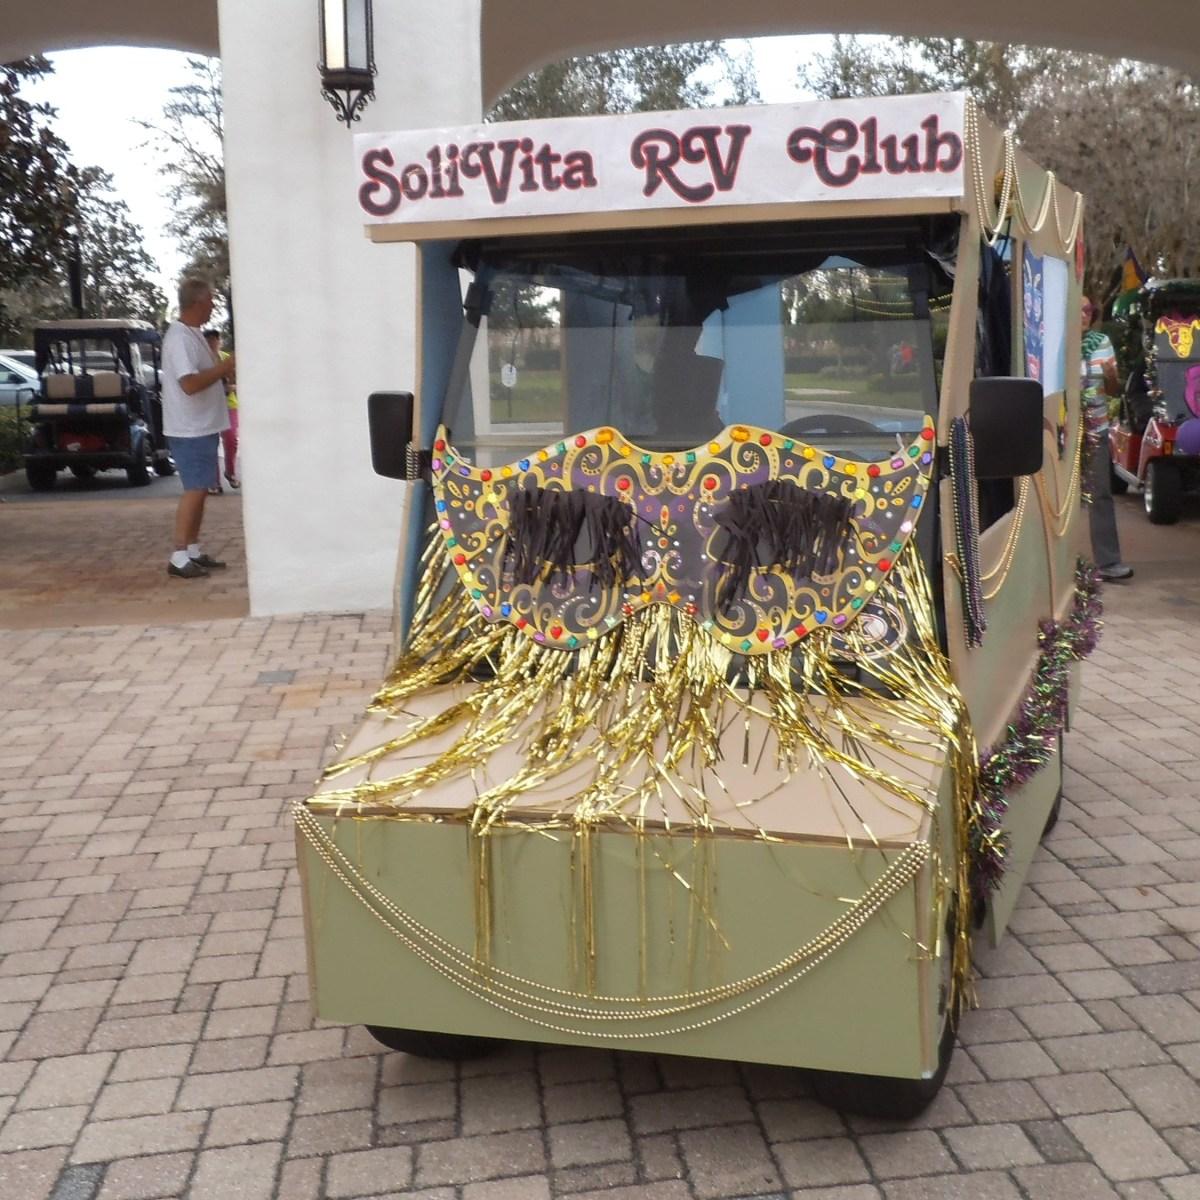 Solivita RV Club Mardi Gras golf cart parade